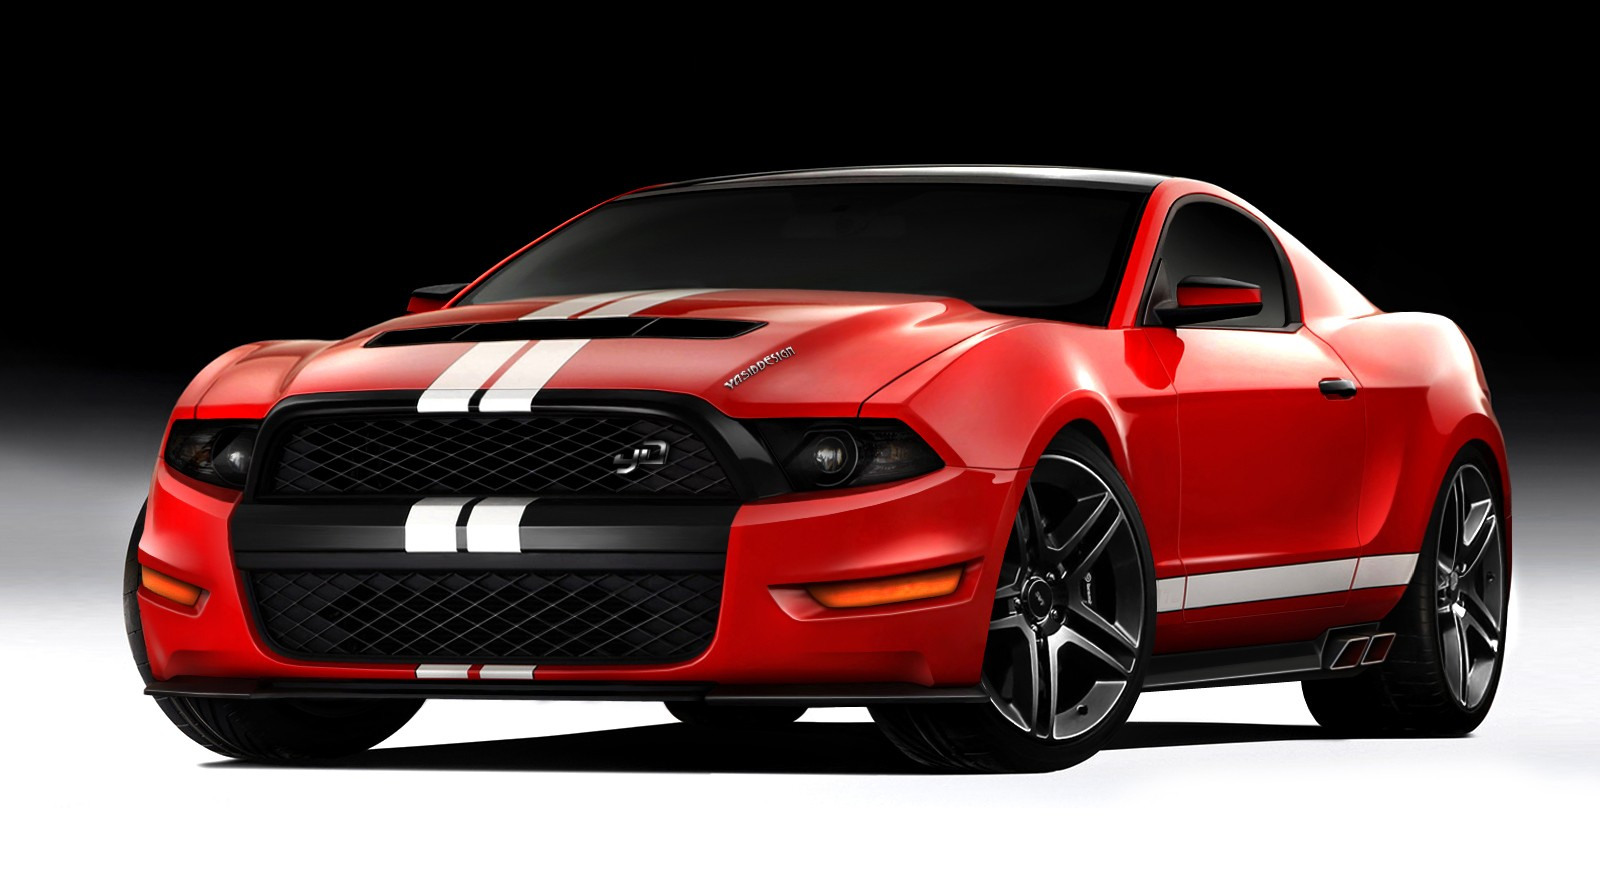 2014 Ford Mustang GT HD Wallpaperjpg 1600x892